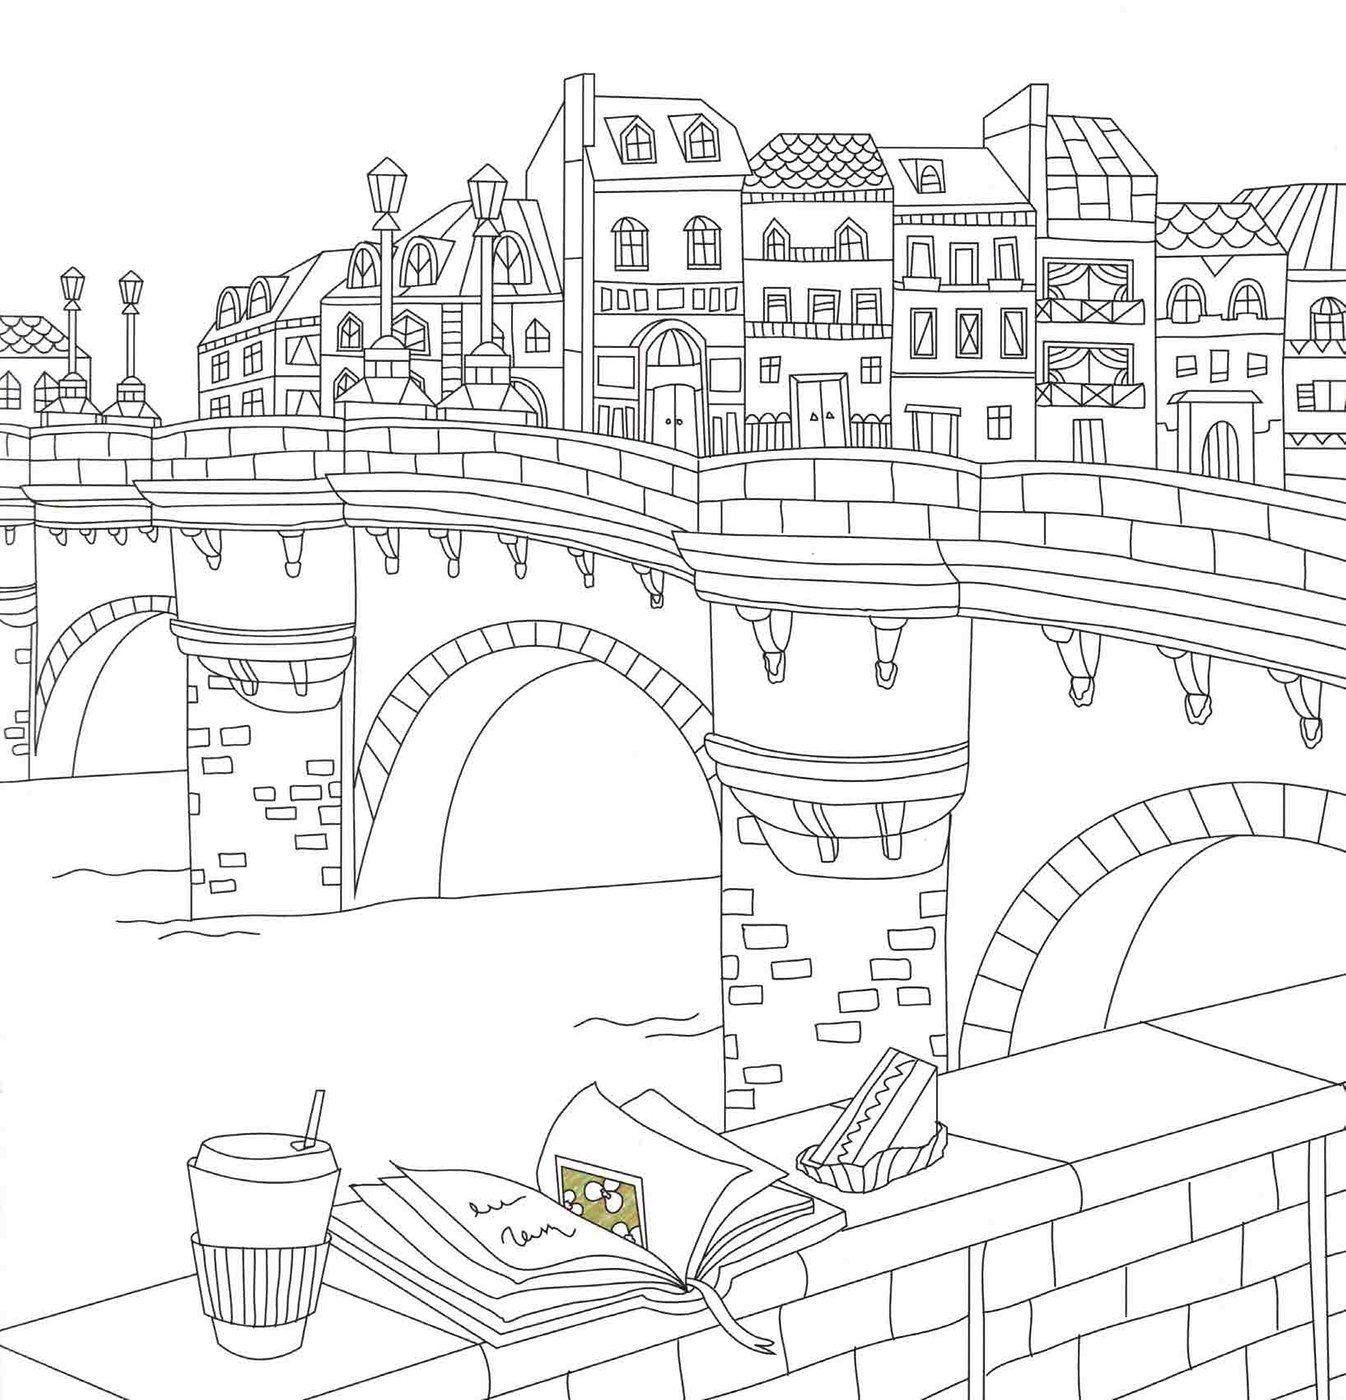 South korea coloring book - France Coloring Travel Book